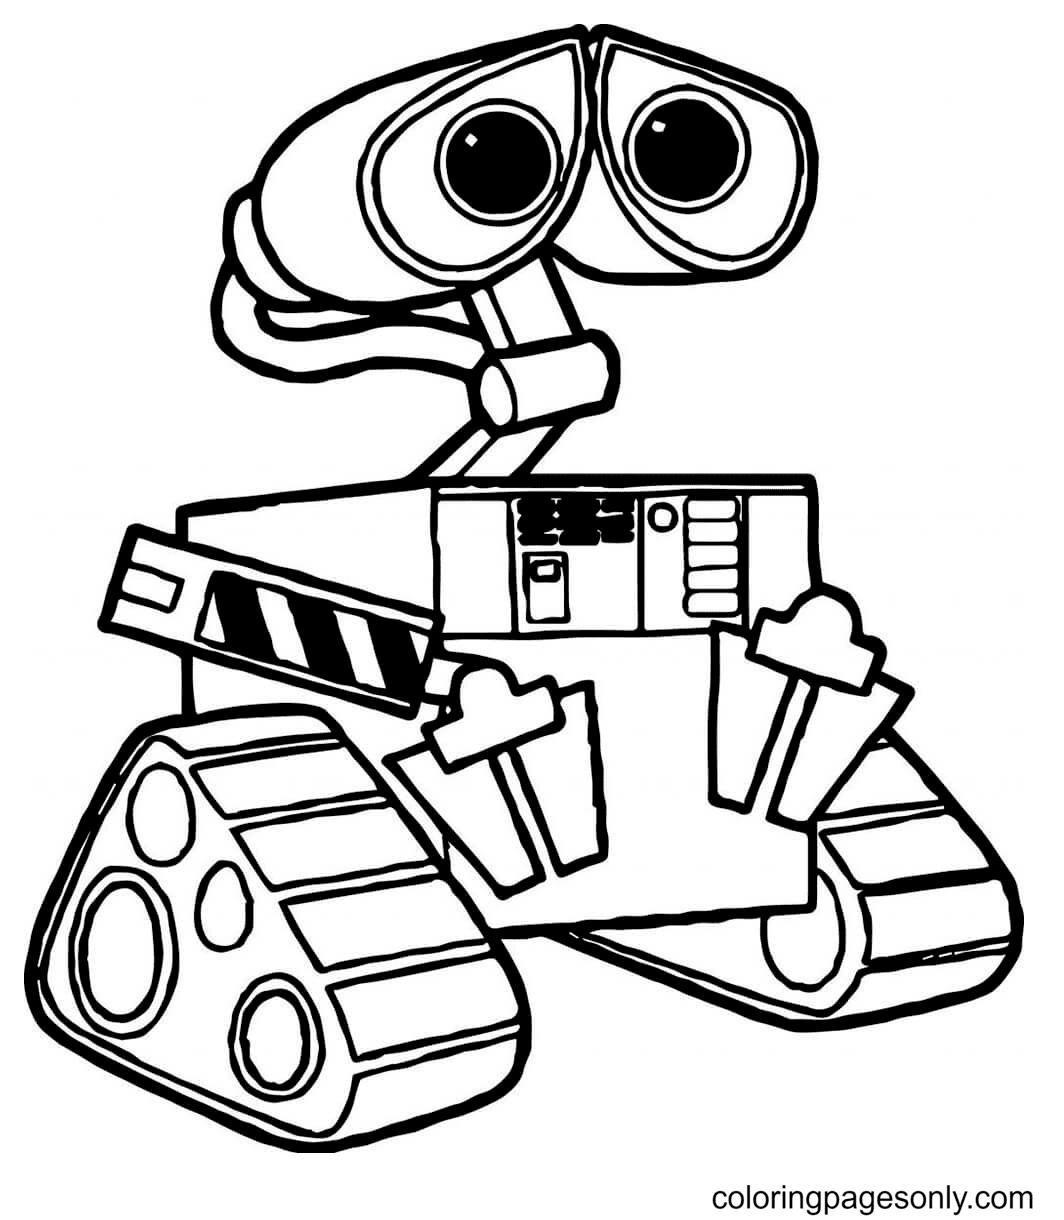 Monitoring Robot Coloring Page